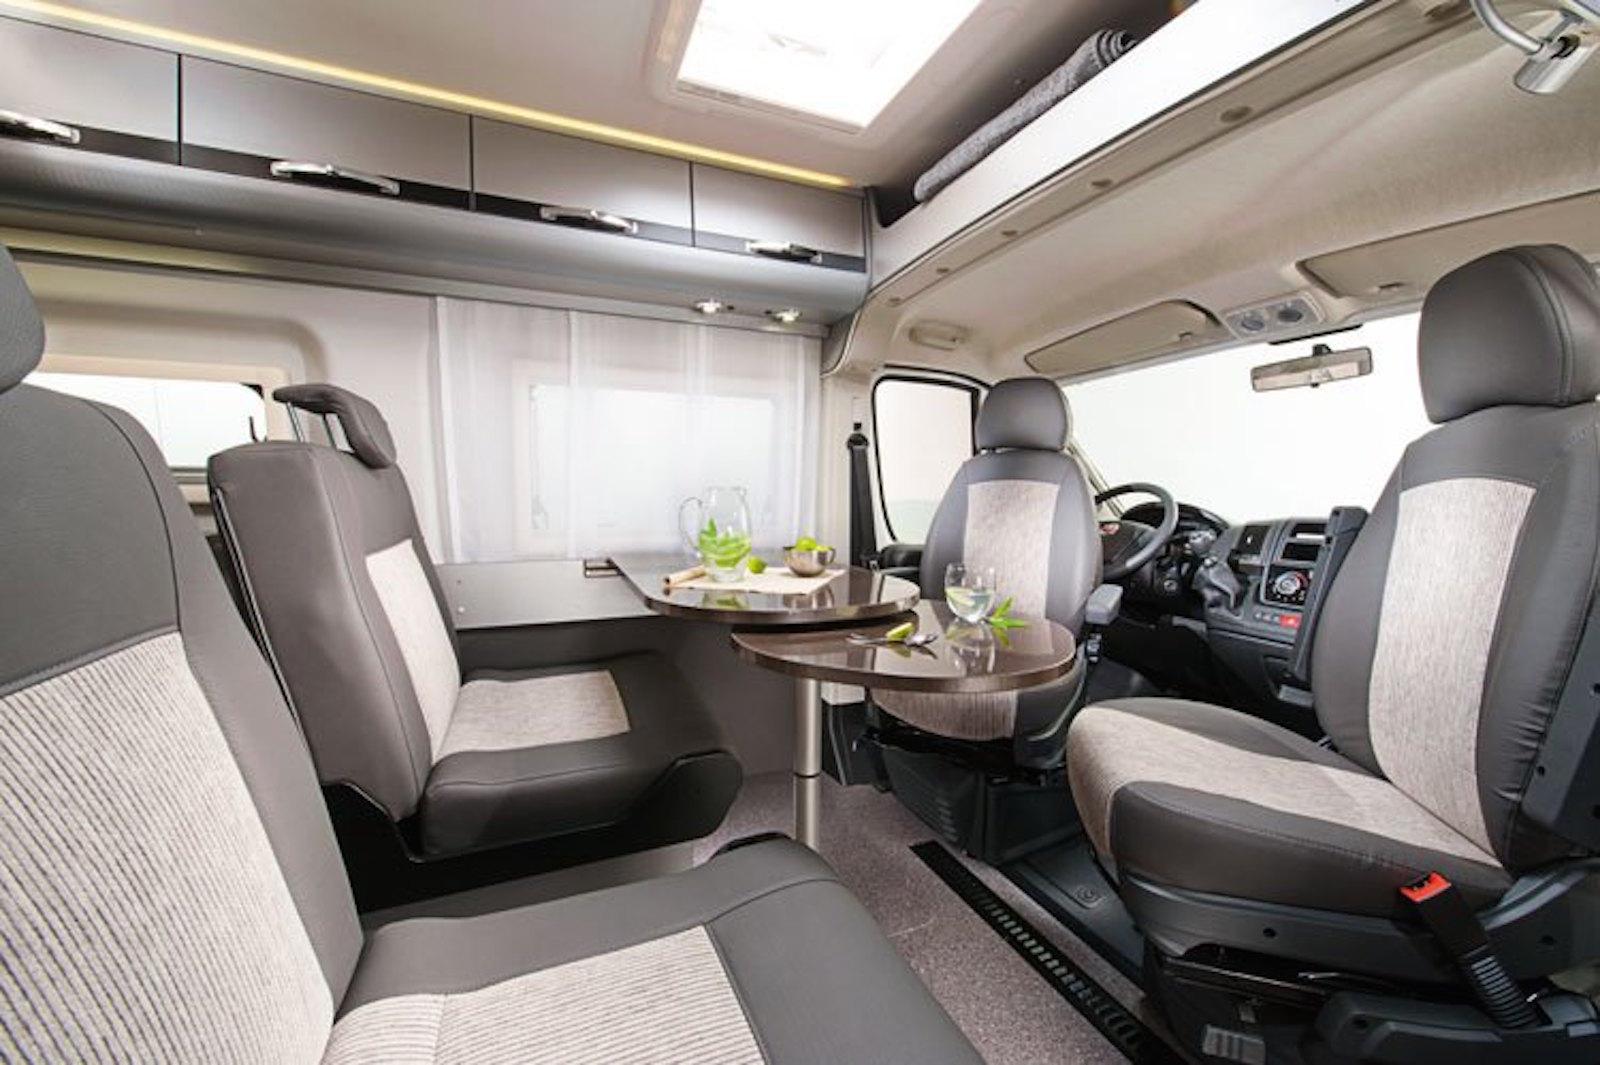 2 Berth Motorhome For Hire Adria Twin 500s Motorhome Holiday Company